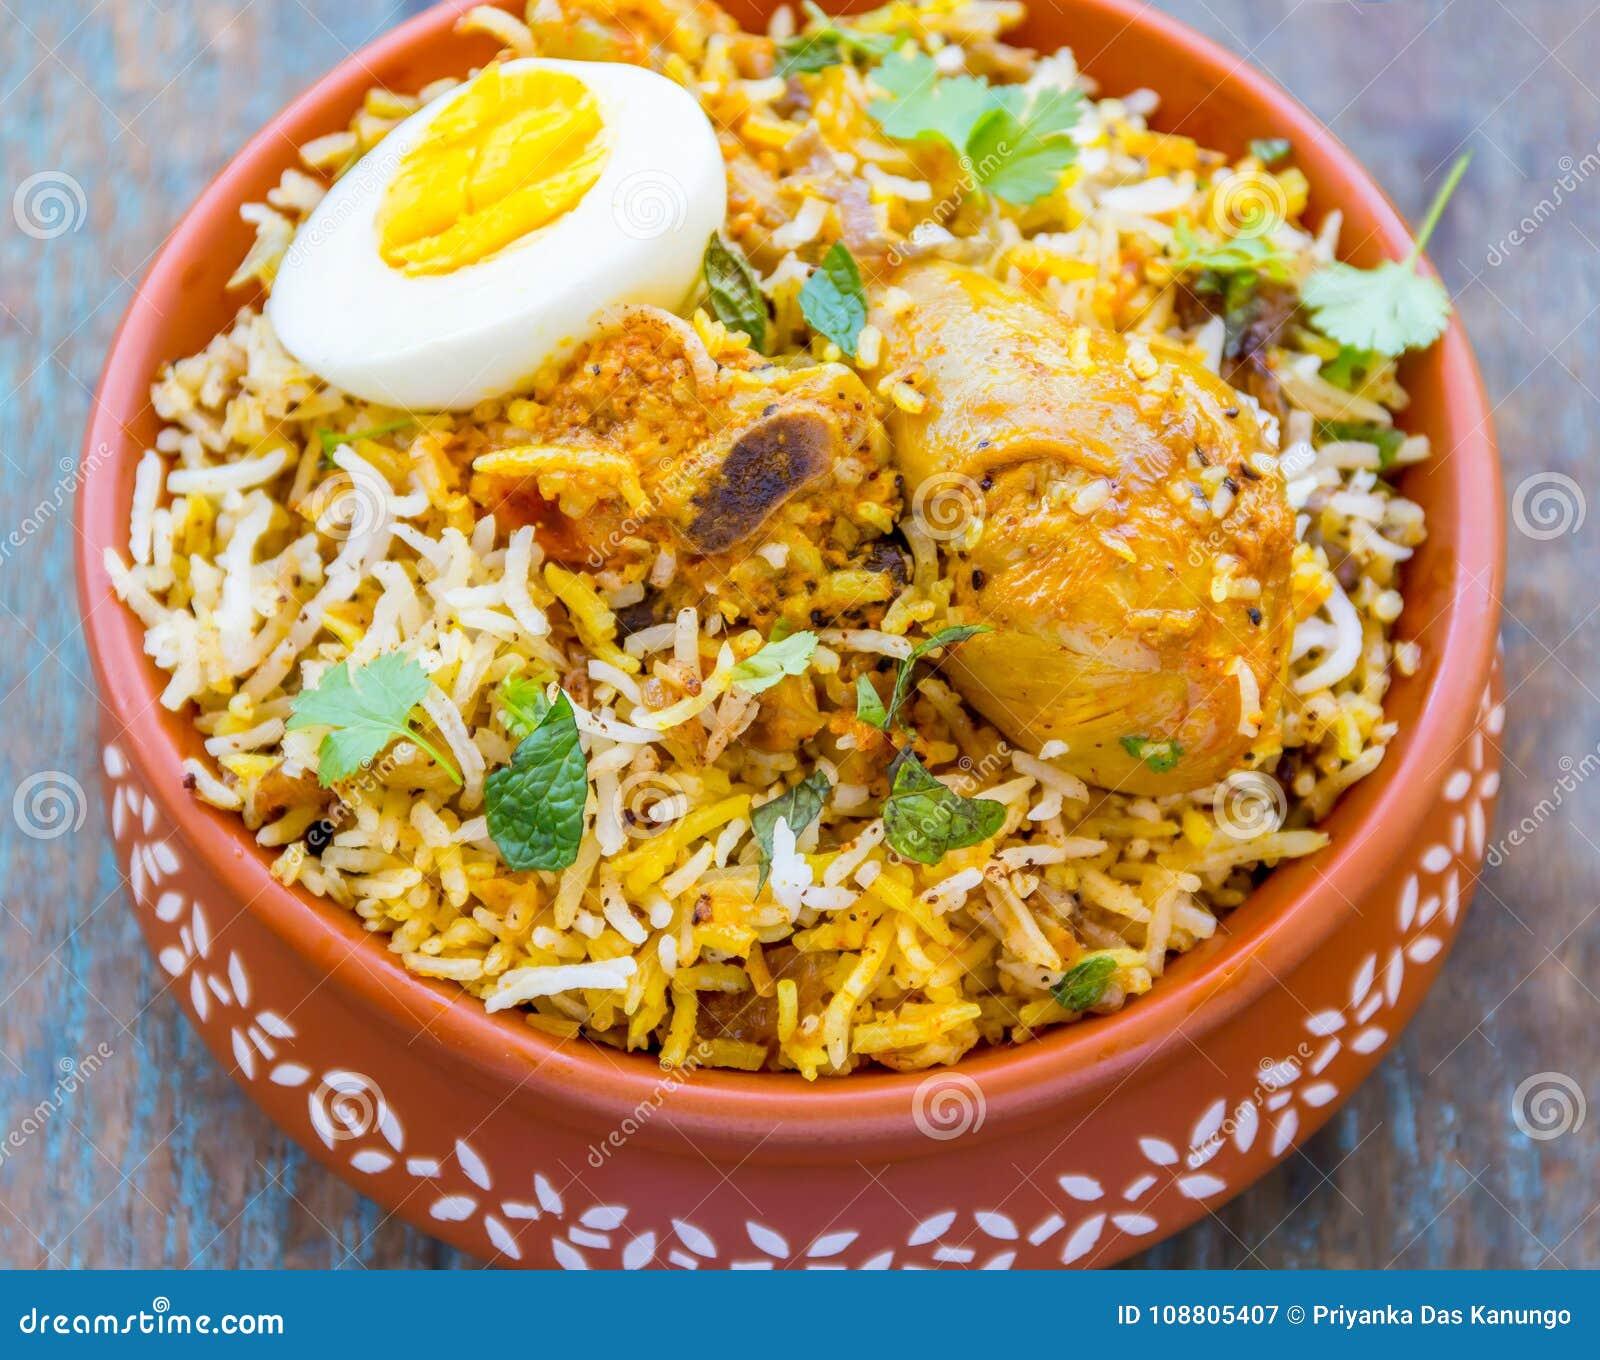 Chicken Biryani - Traditional Indian Rice Dish With ...